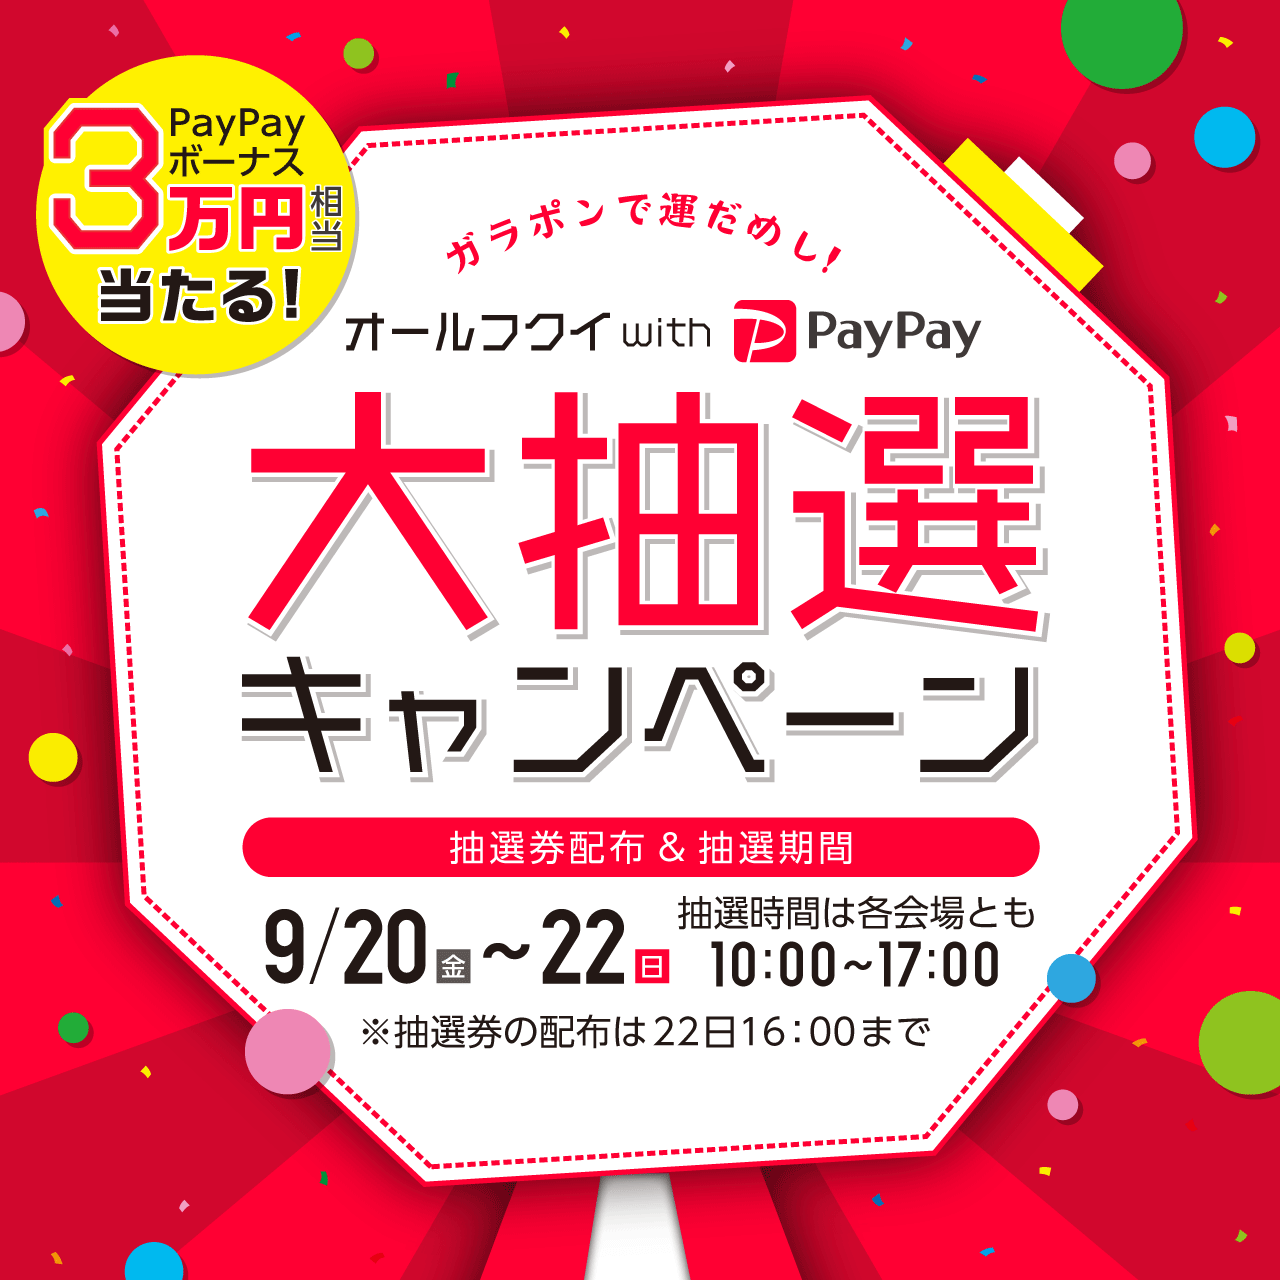 PayPayボーナス3万円相当当たる!オールフクイ with PayPay 大抽選キャンペーン